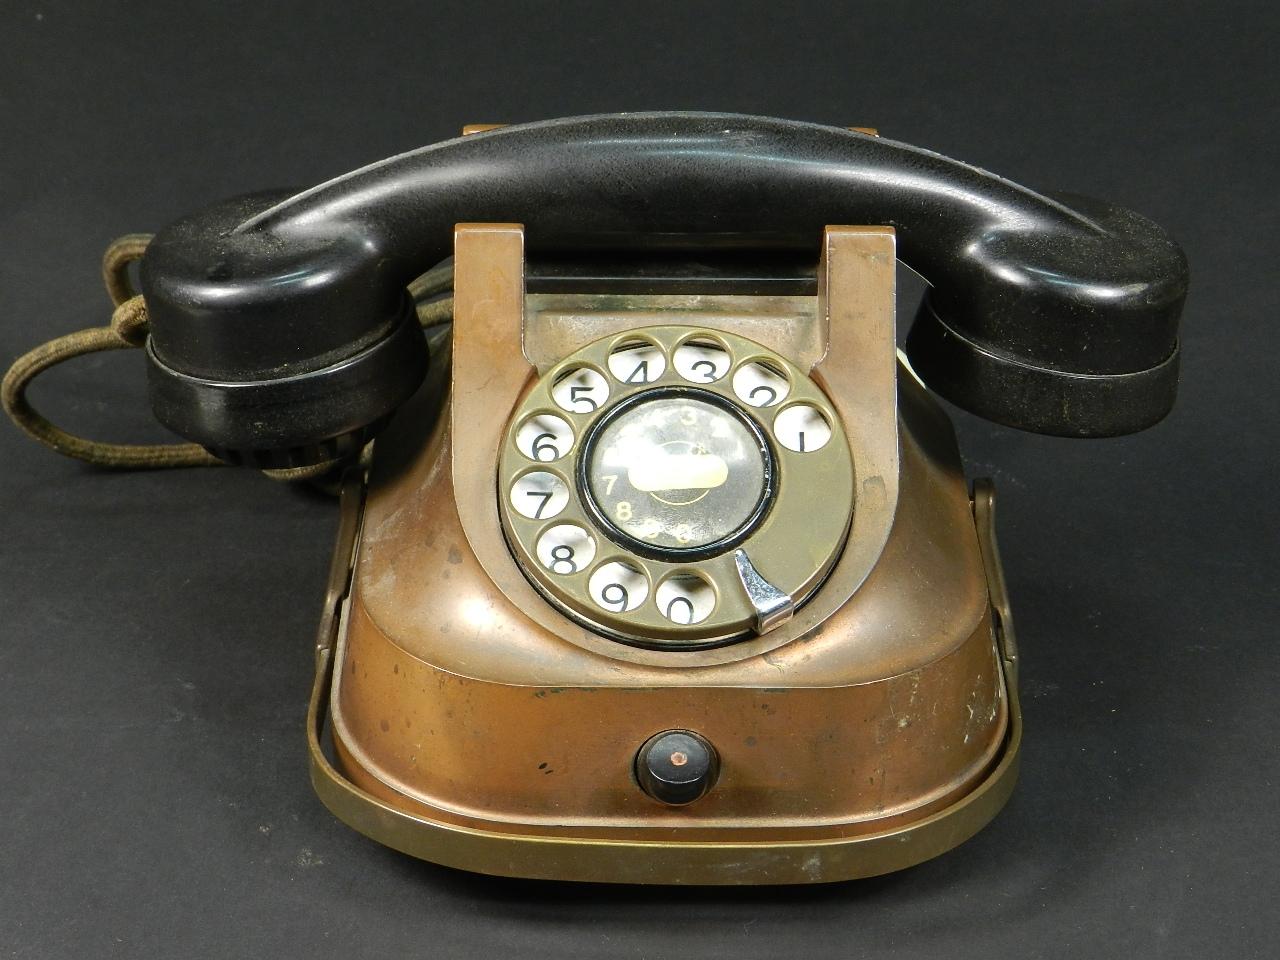 Imagen TELÉFONO DE COBRE AÑO 1940 28092